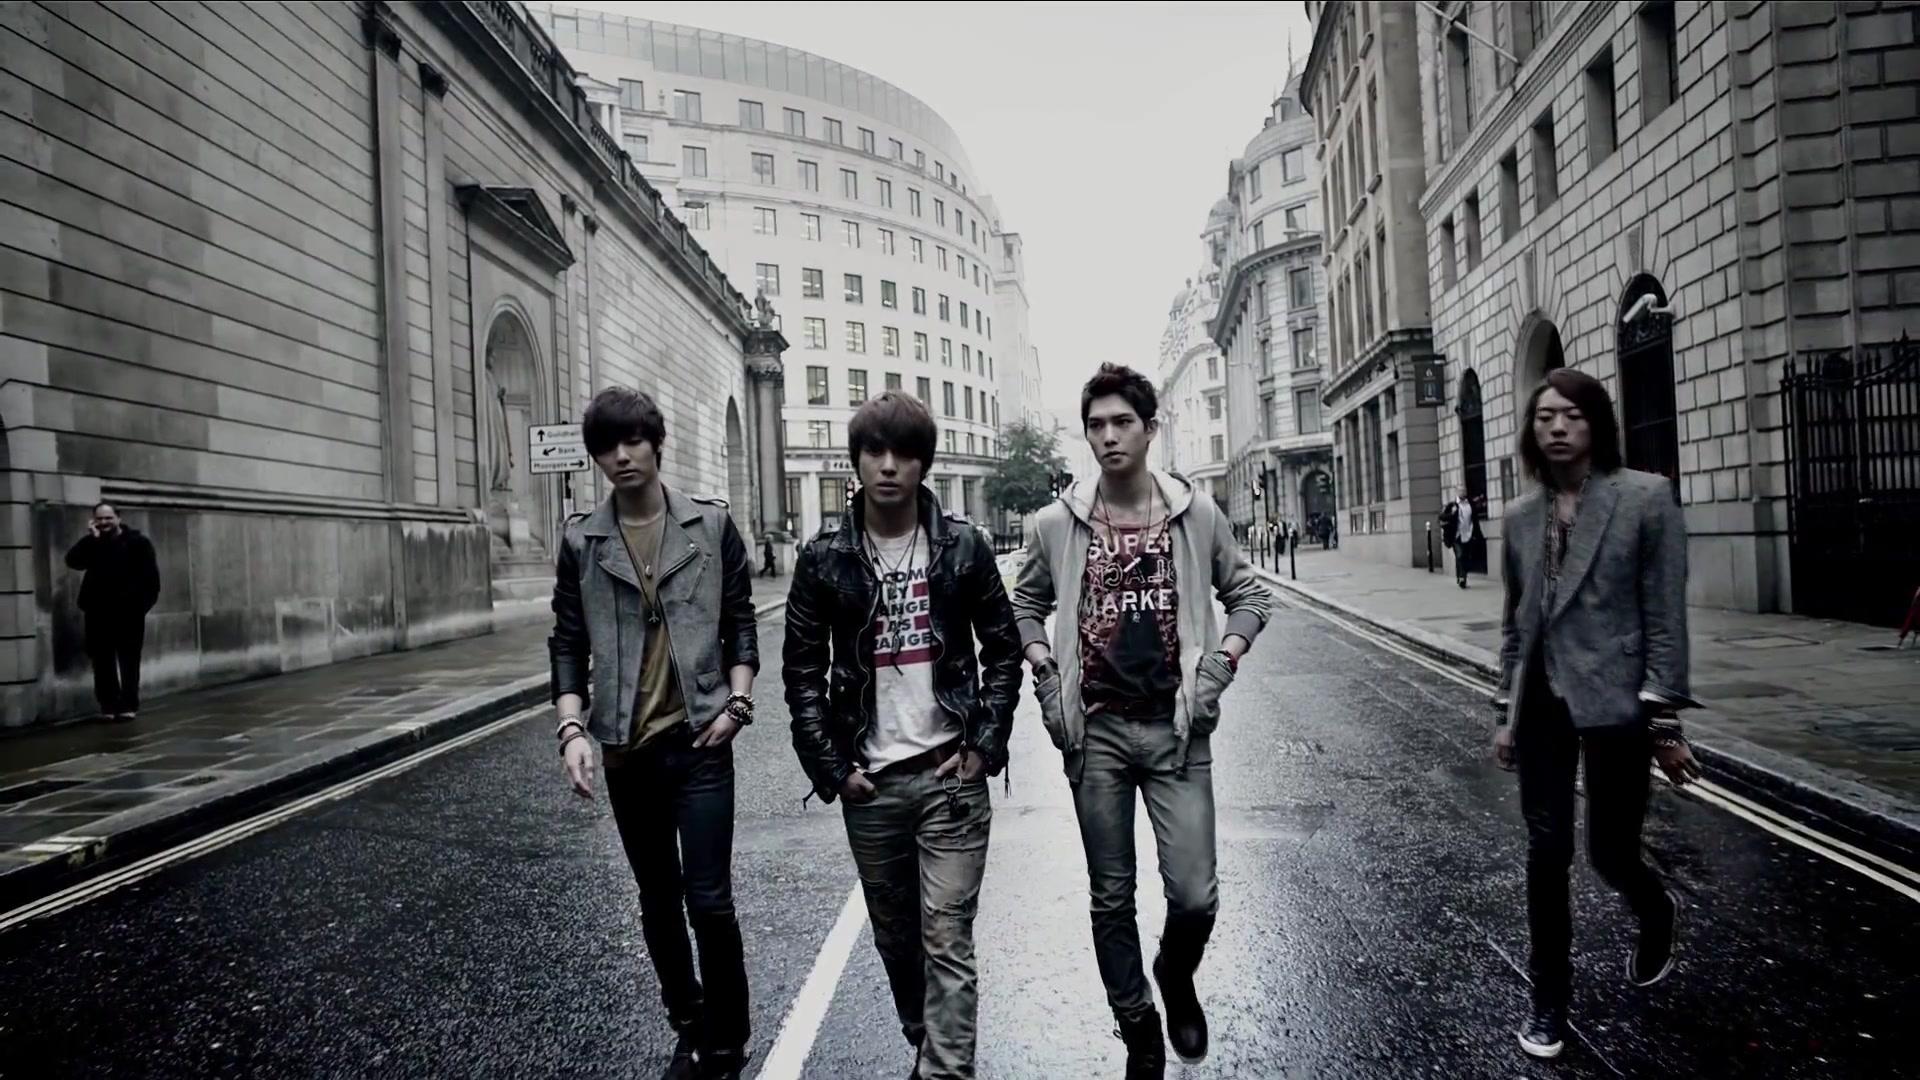 011313_CNBLUE2_Newalbumsandsinglespreview